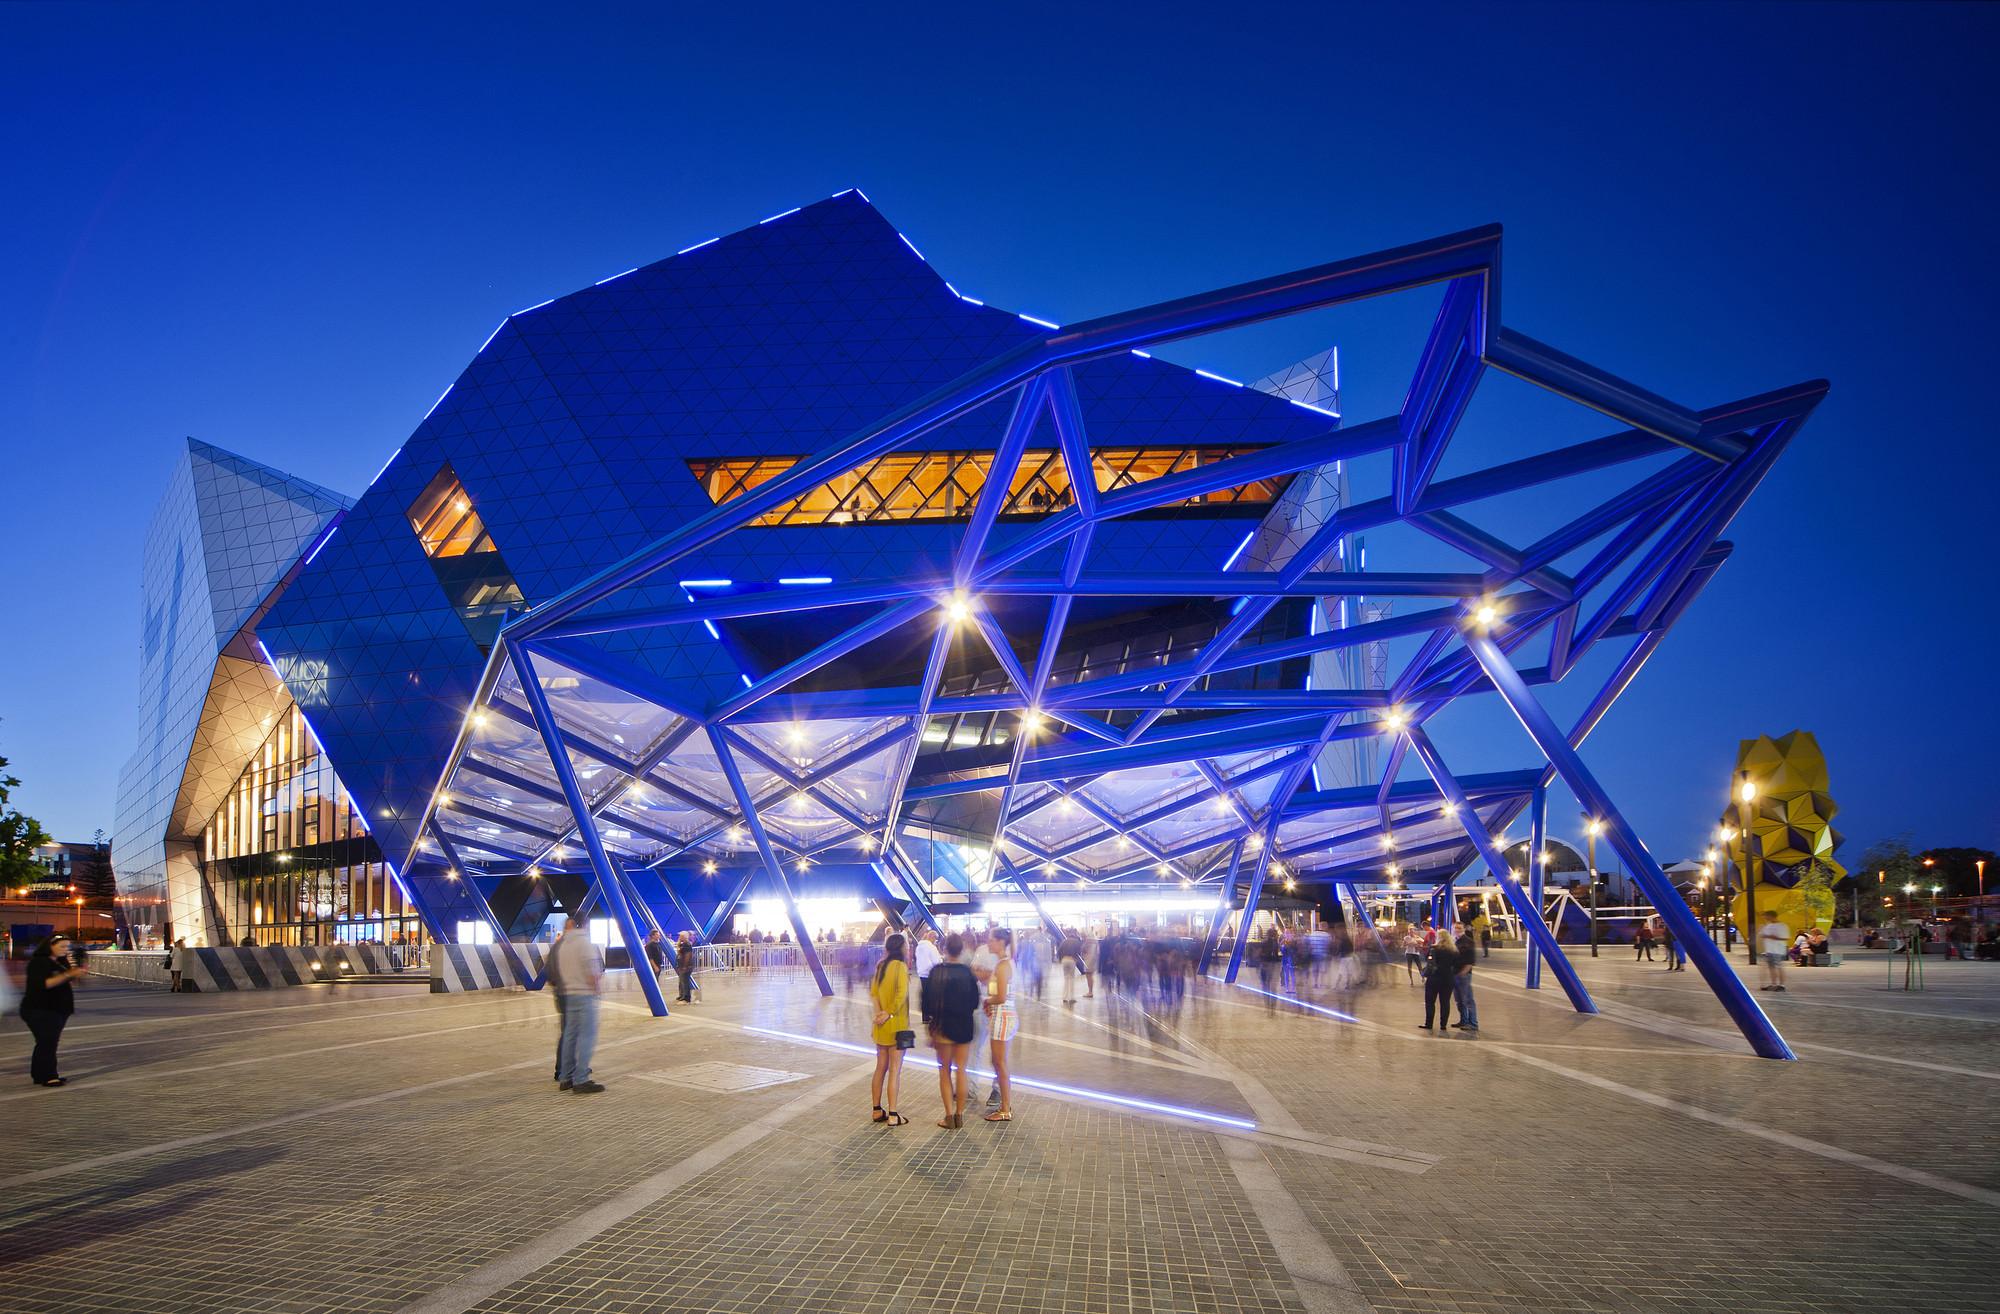 Perth Arena Arm Architecture Ccn Archdaily